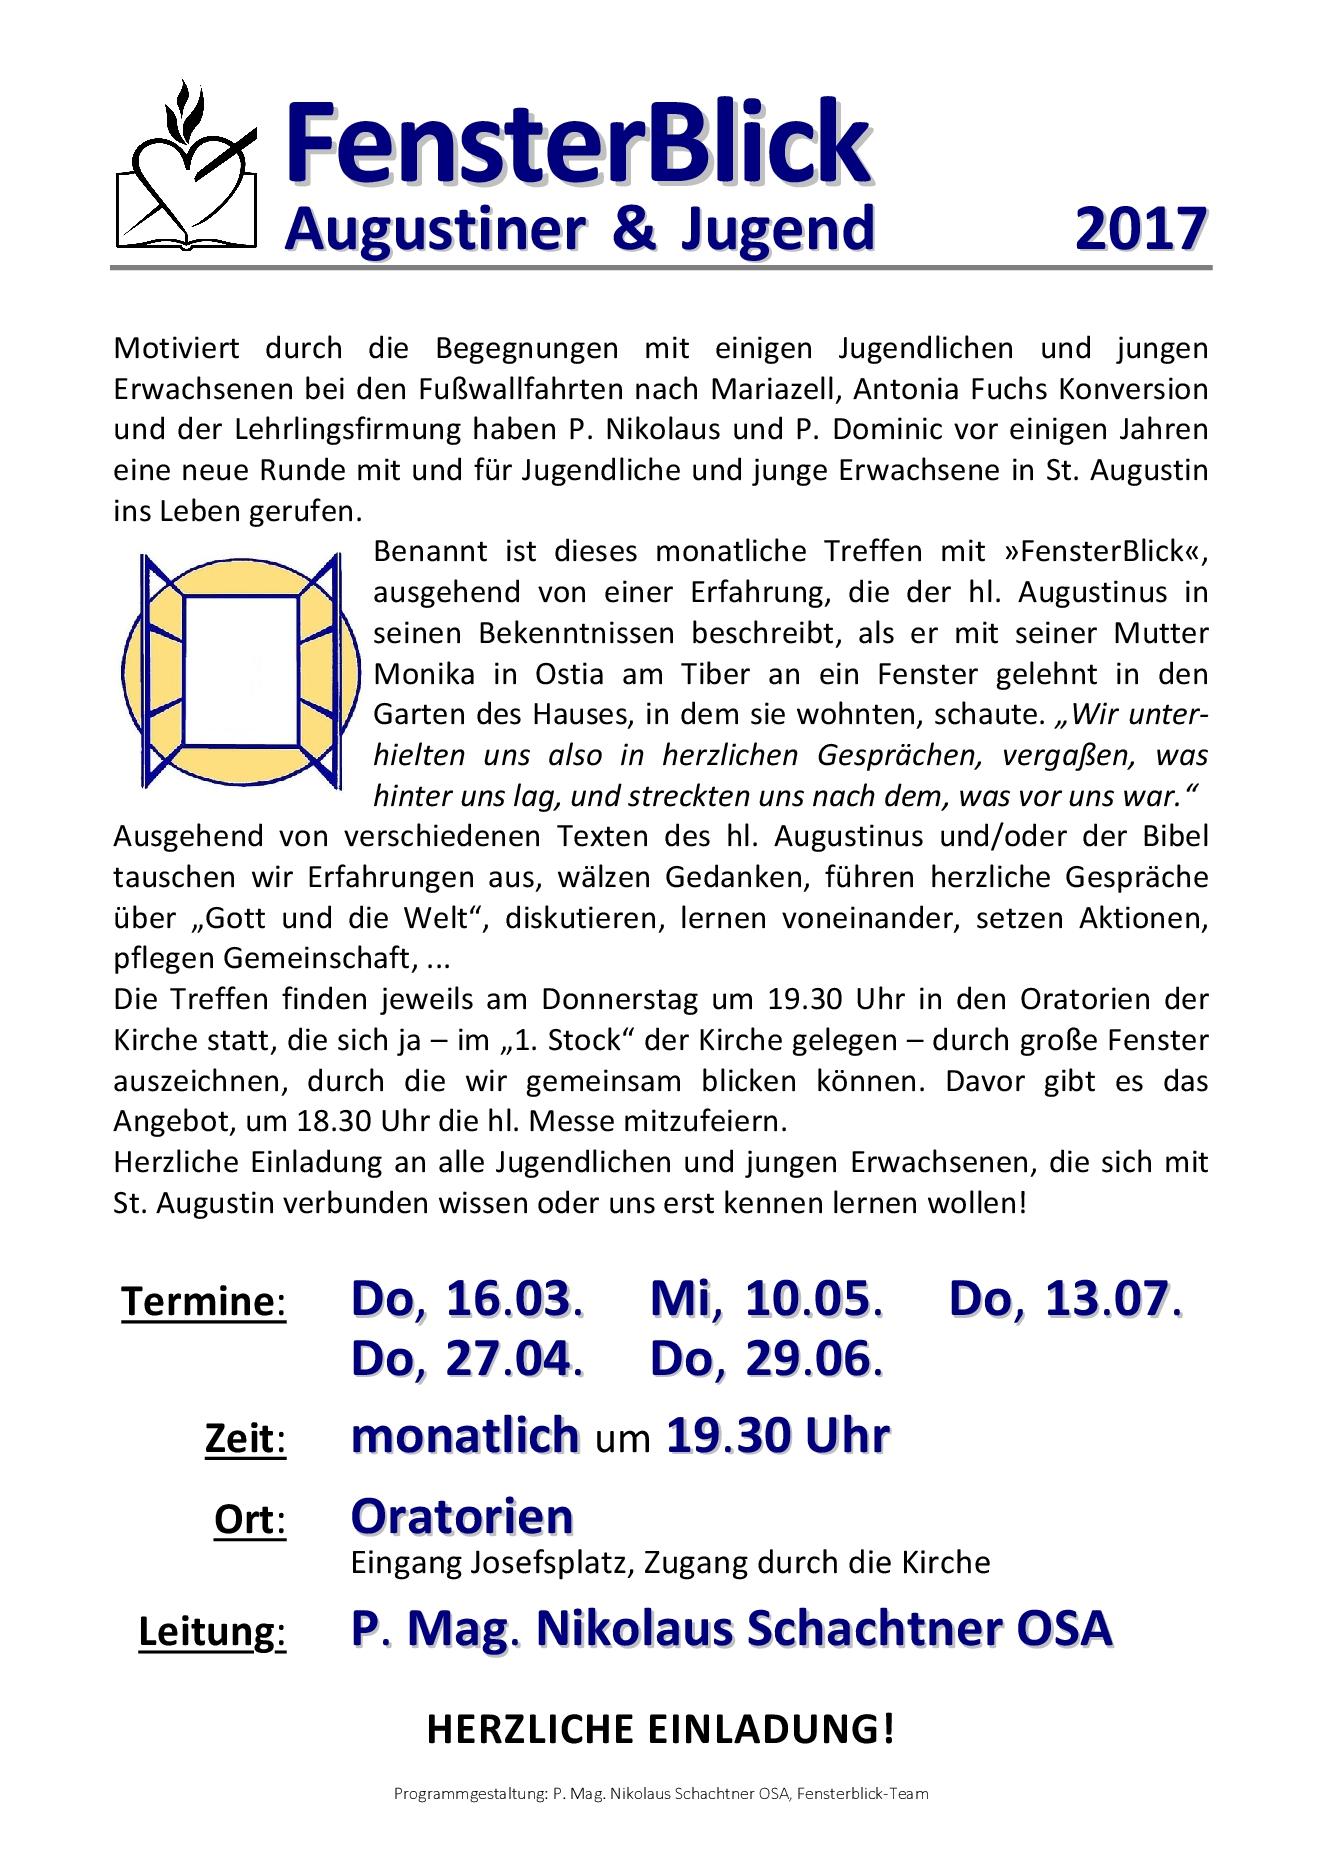 Fensterblick 2017 - hellblau